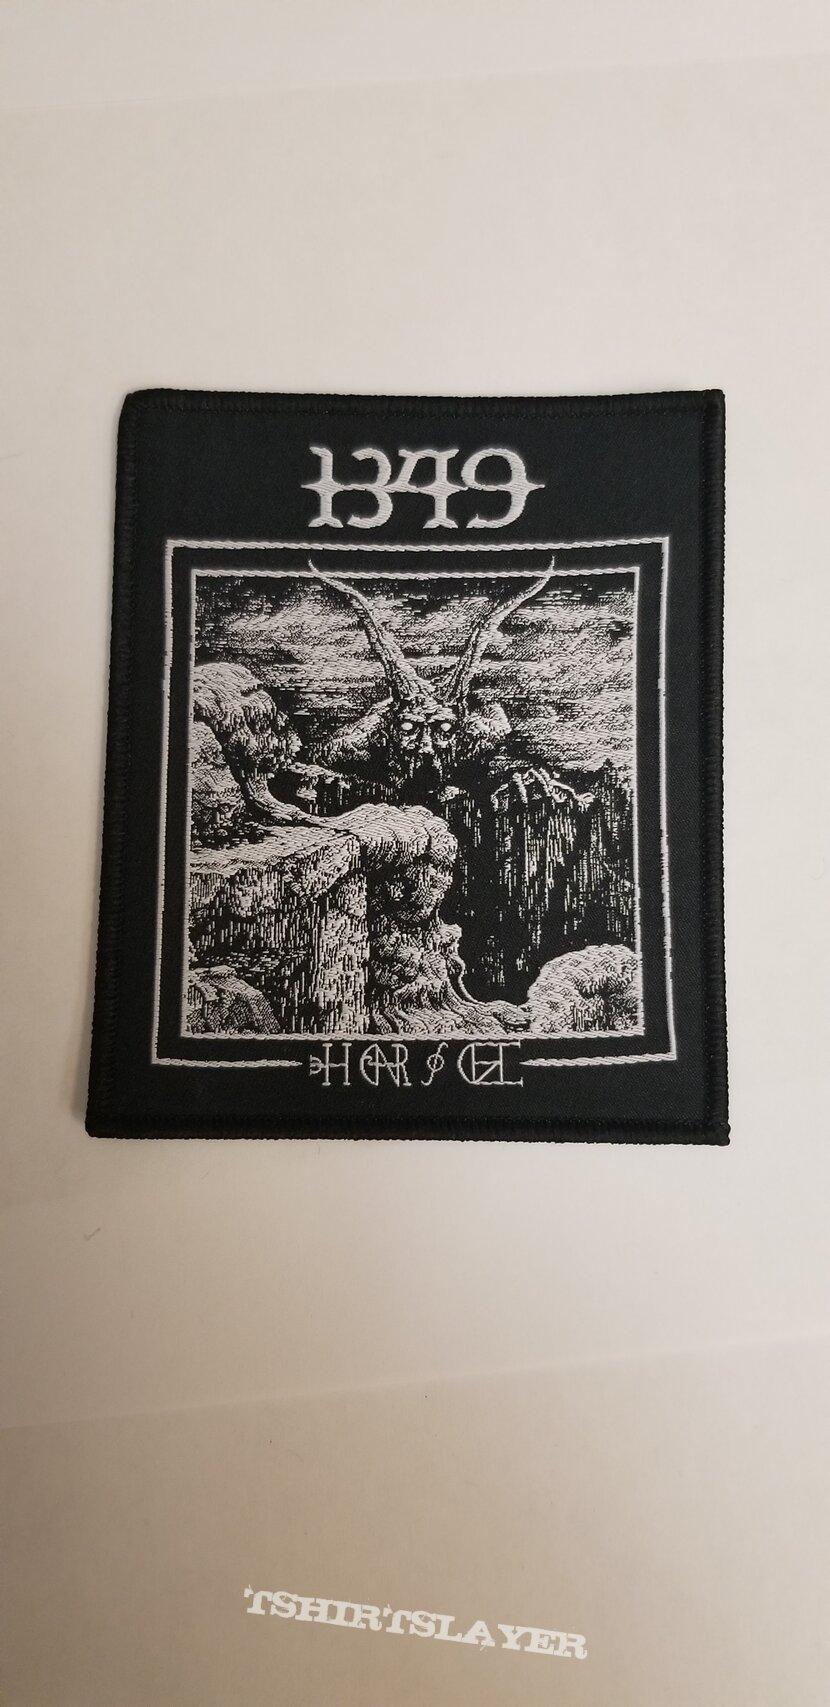 1349 - Cavern